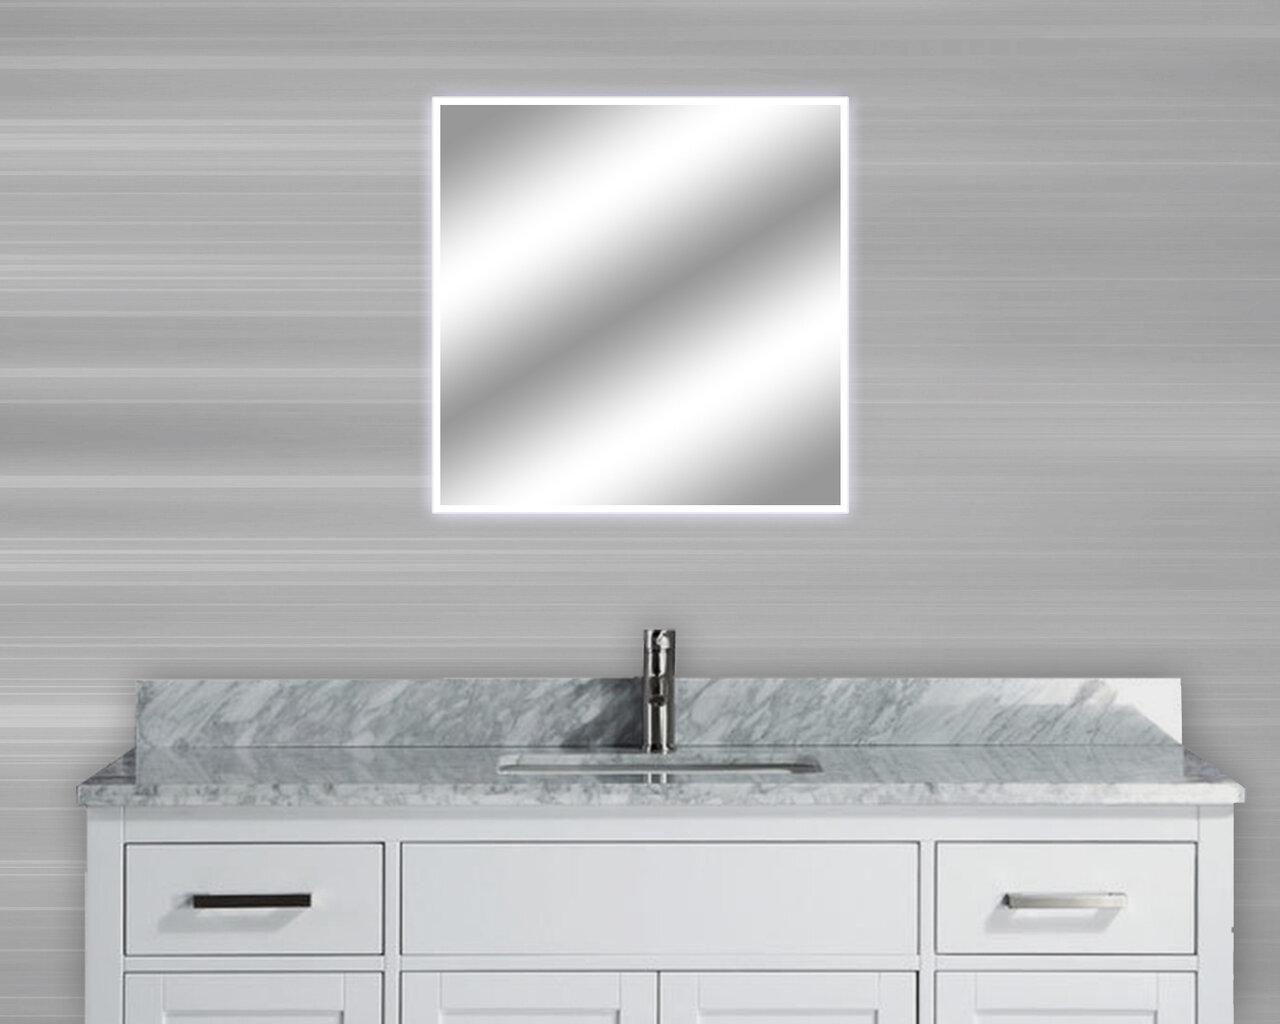 MTDVanities Encore Activated Illuminated LED Bathroom/Vanity Mirror ...